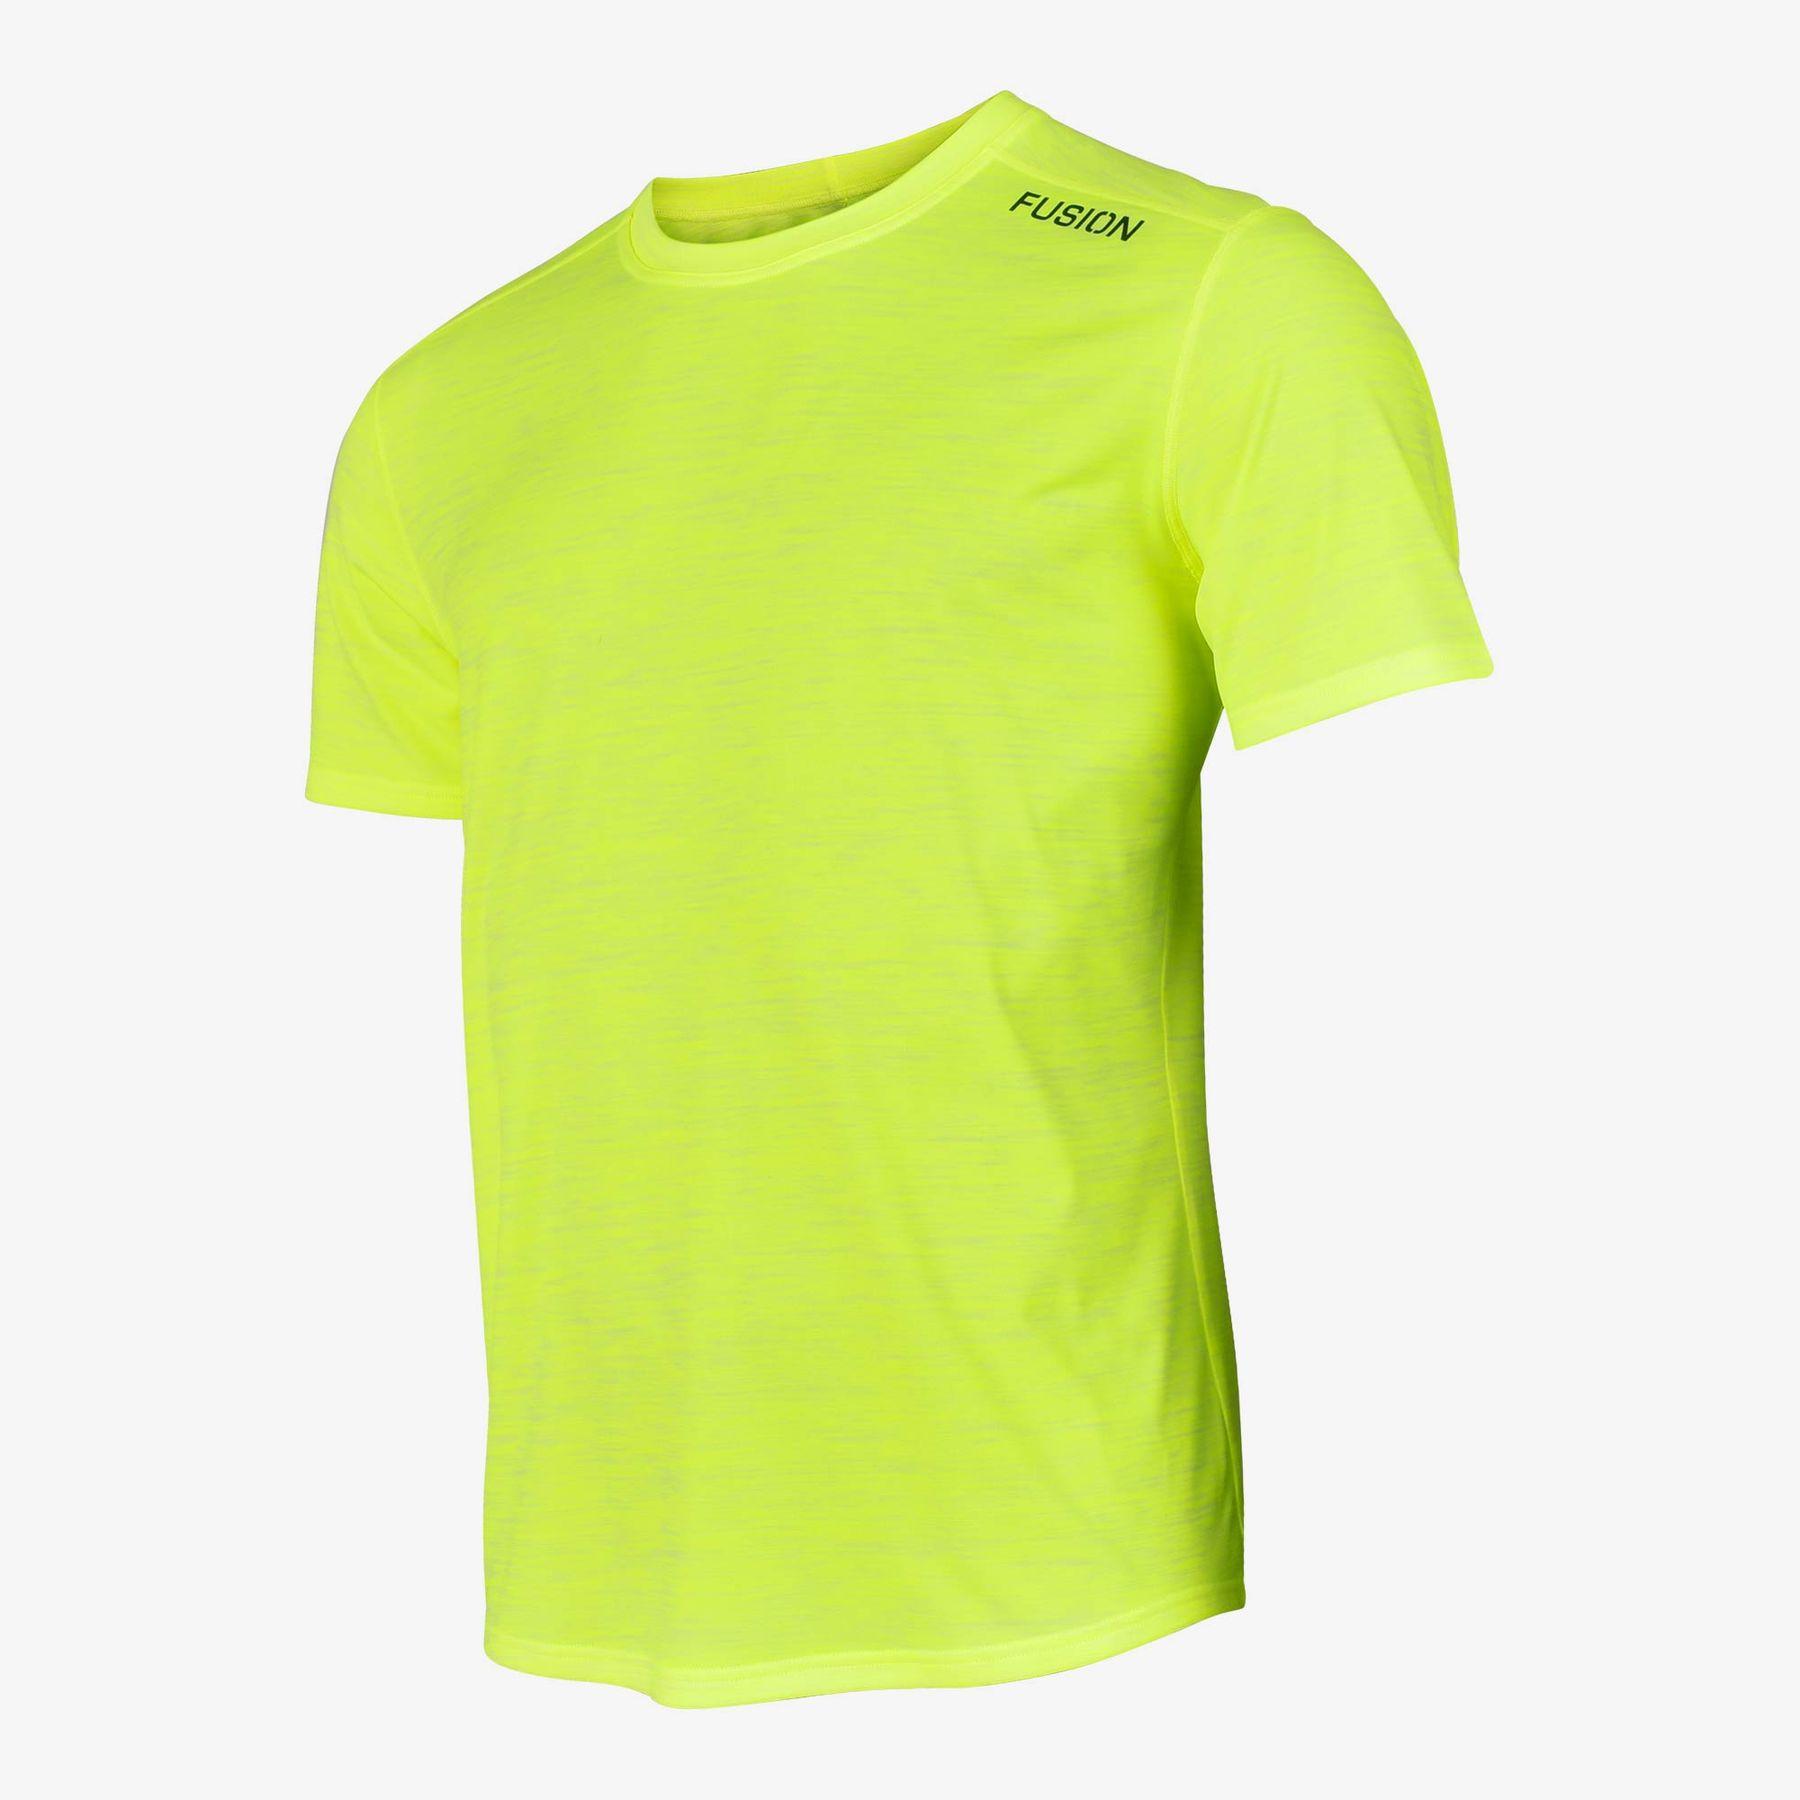 Fusion C3 T-Shirt (Yellow)